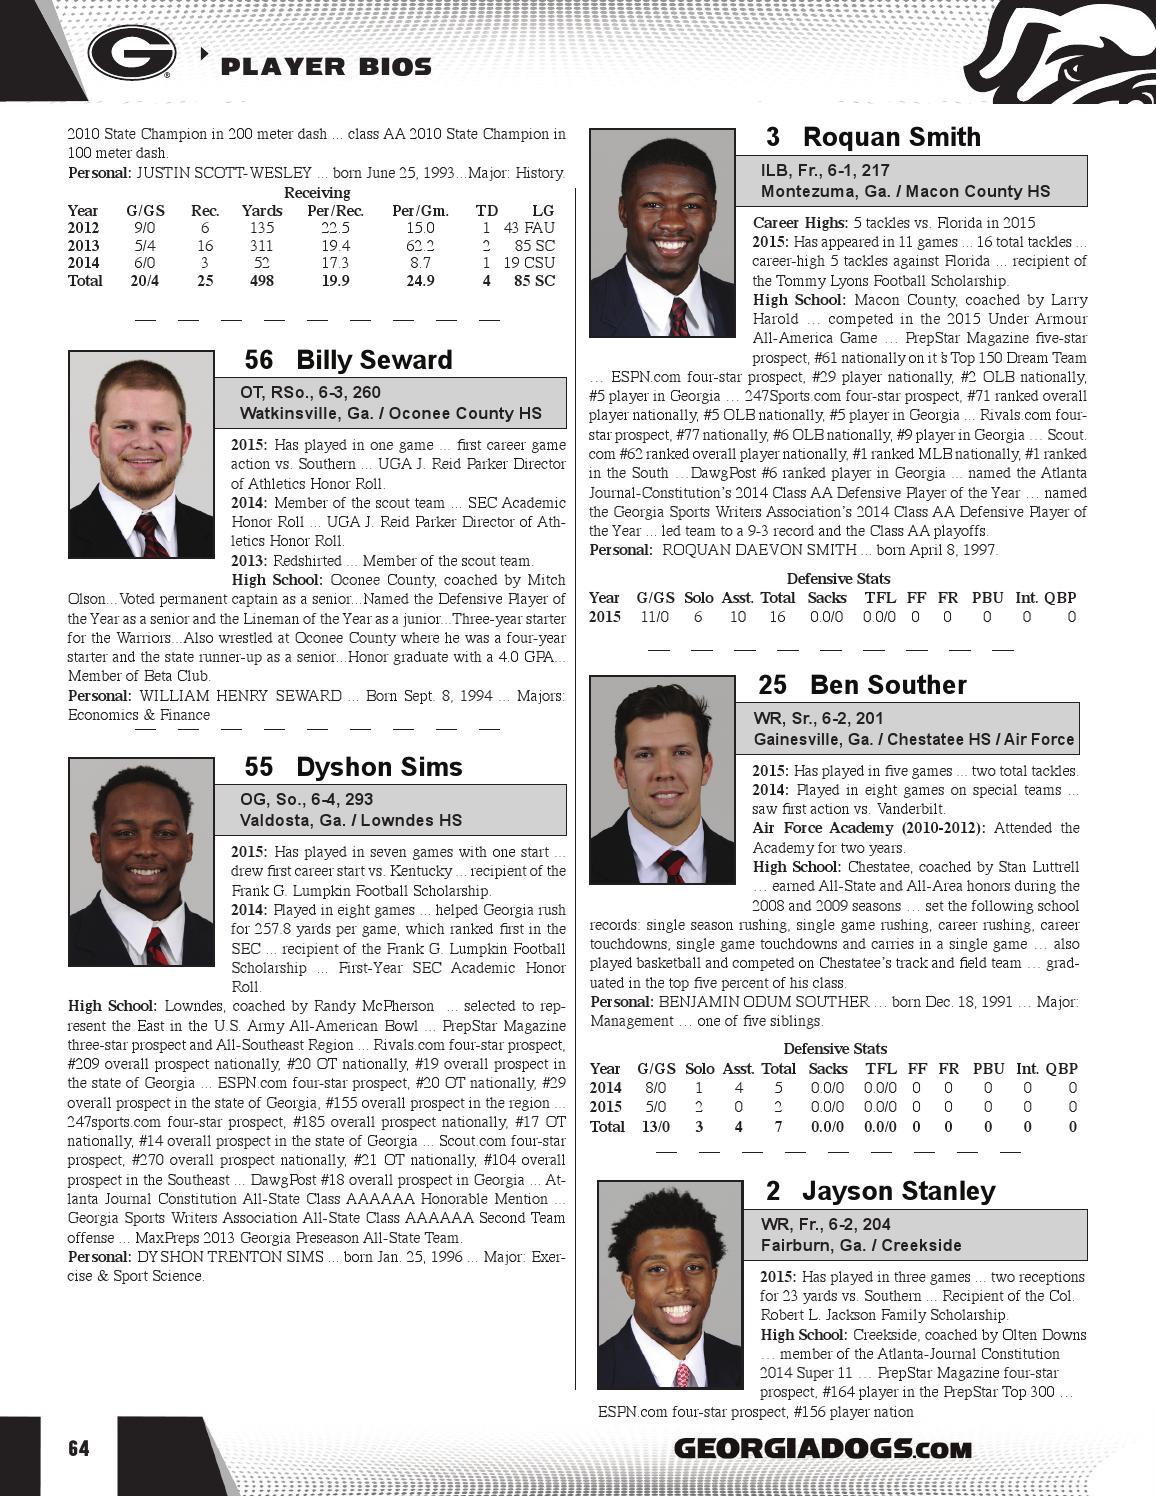 2016 Georgia Football TaxSlayer Bowl Media Guide by Georgia